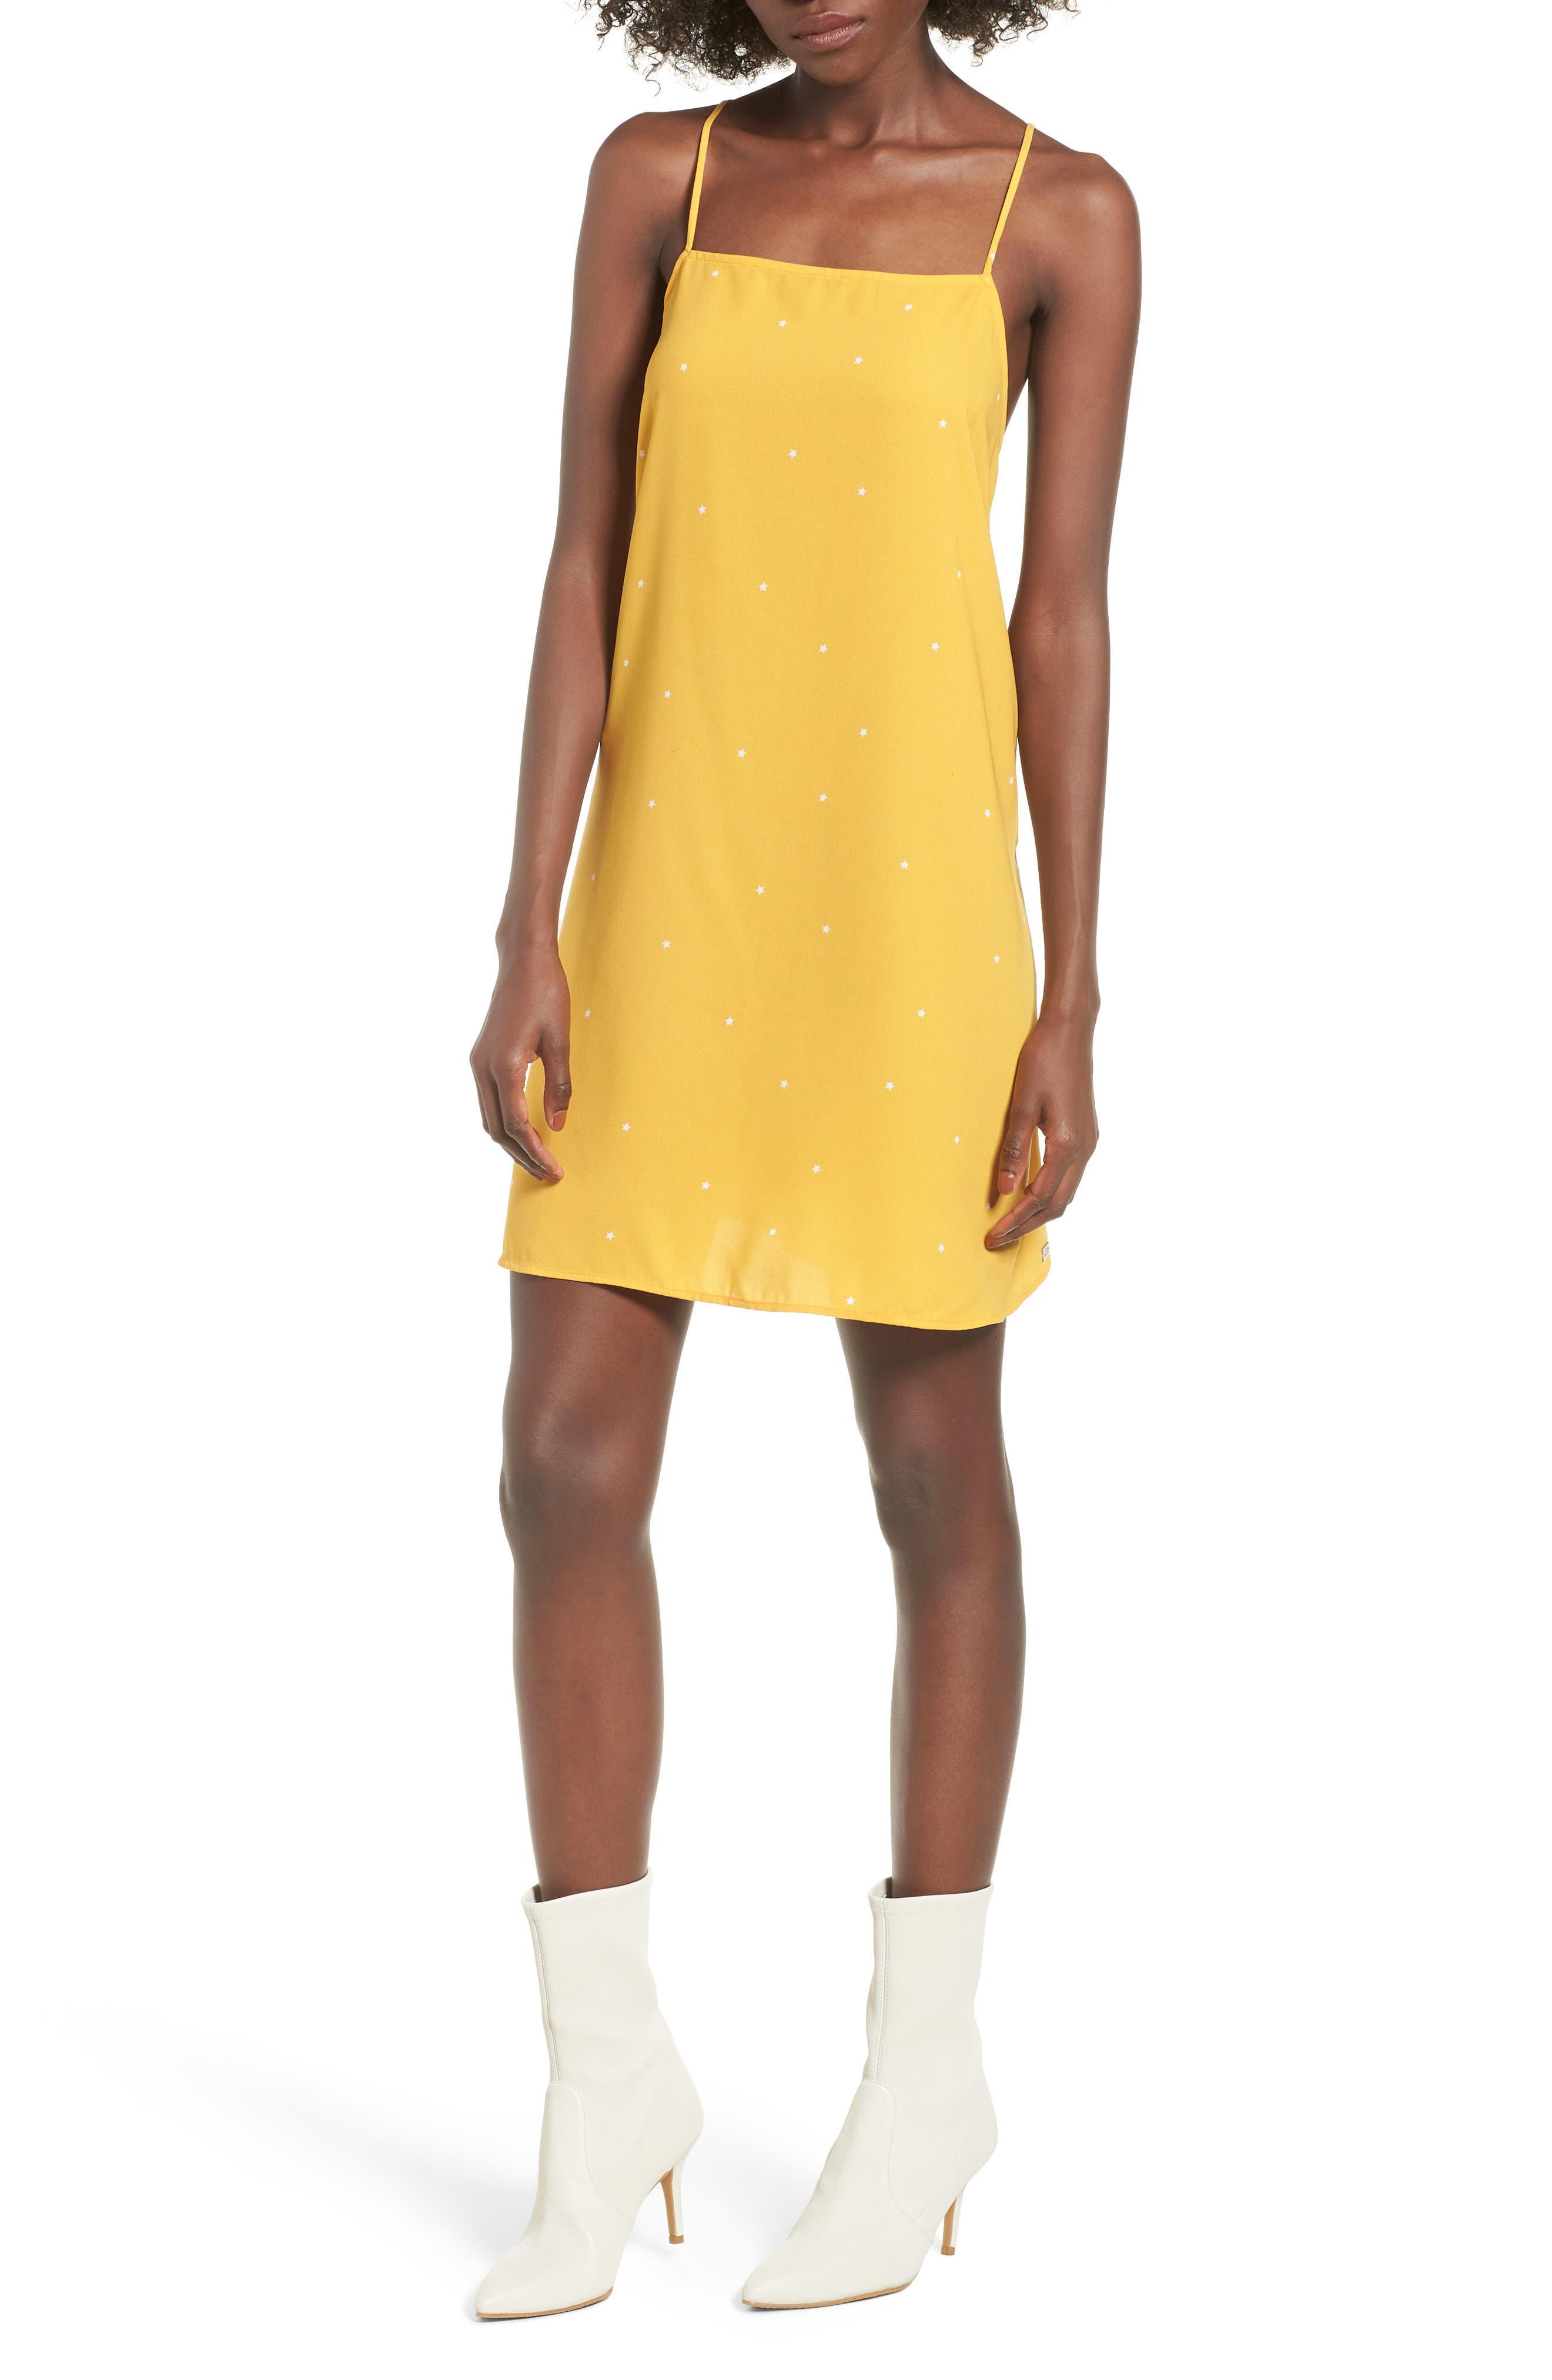 Mental 4 Metal Star Print Dress,                             Main thumbnail 1, color,                             Citrus Gold